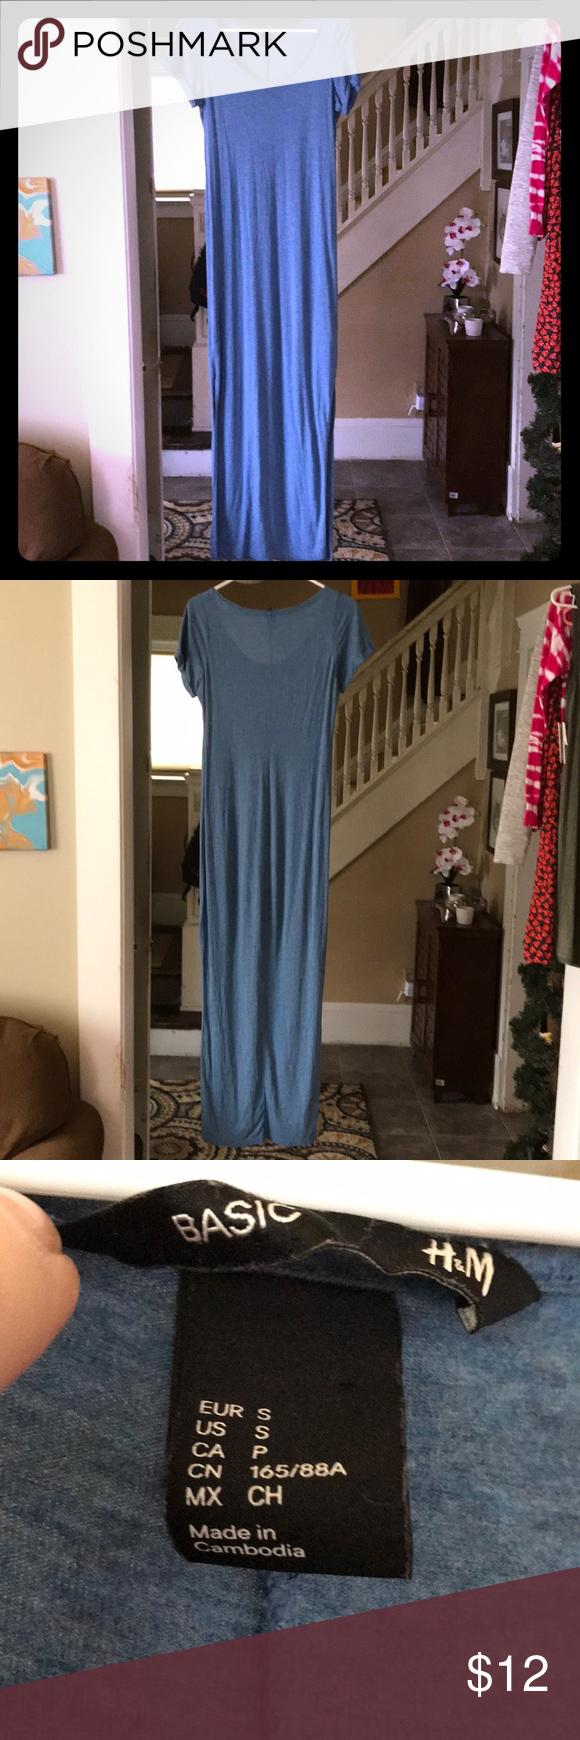 5 For 25 Basic H M T Shirt Dress T Shirt Dress Dresses Shirt Dress [ 1740 x 580 Pixel ]